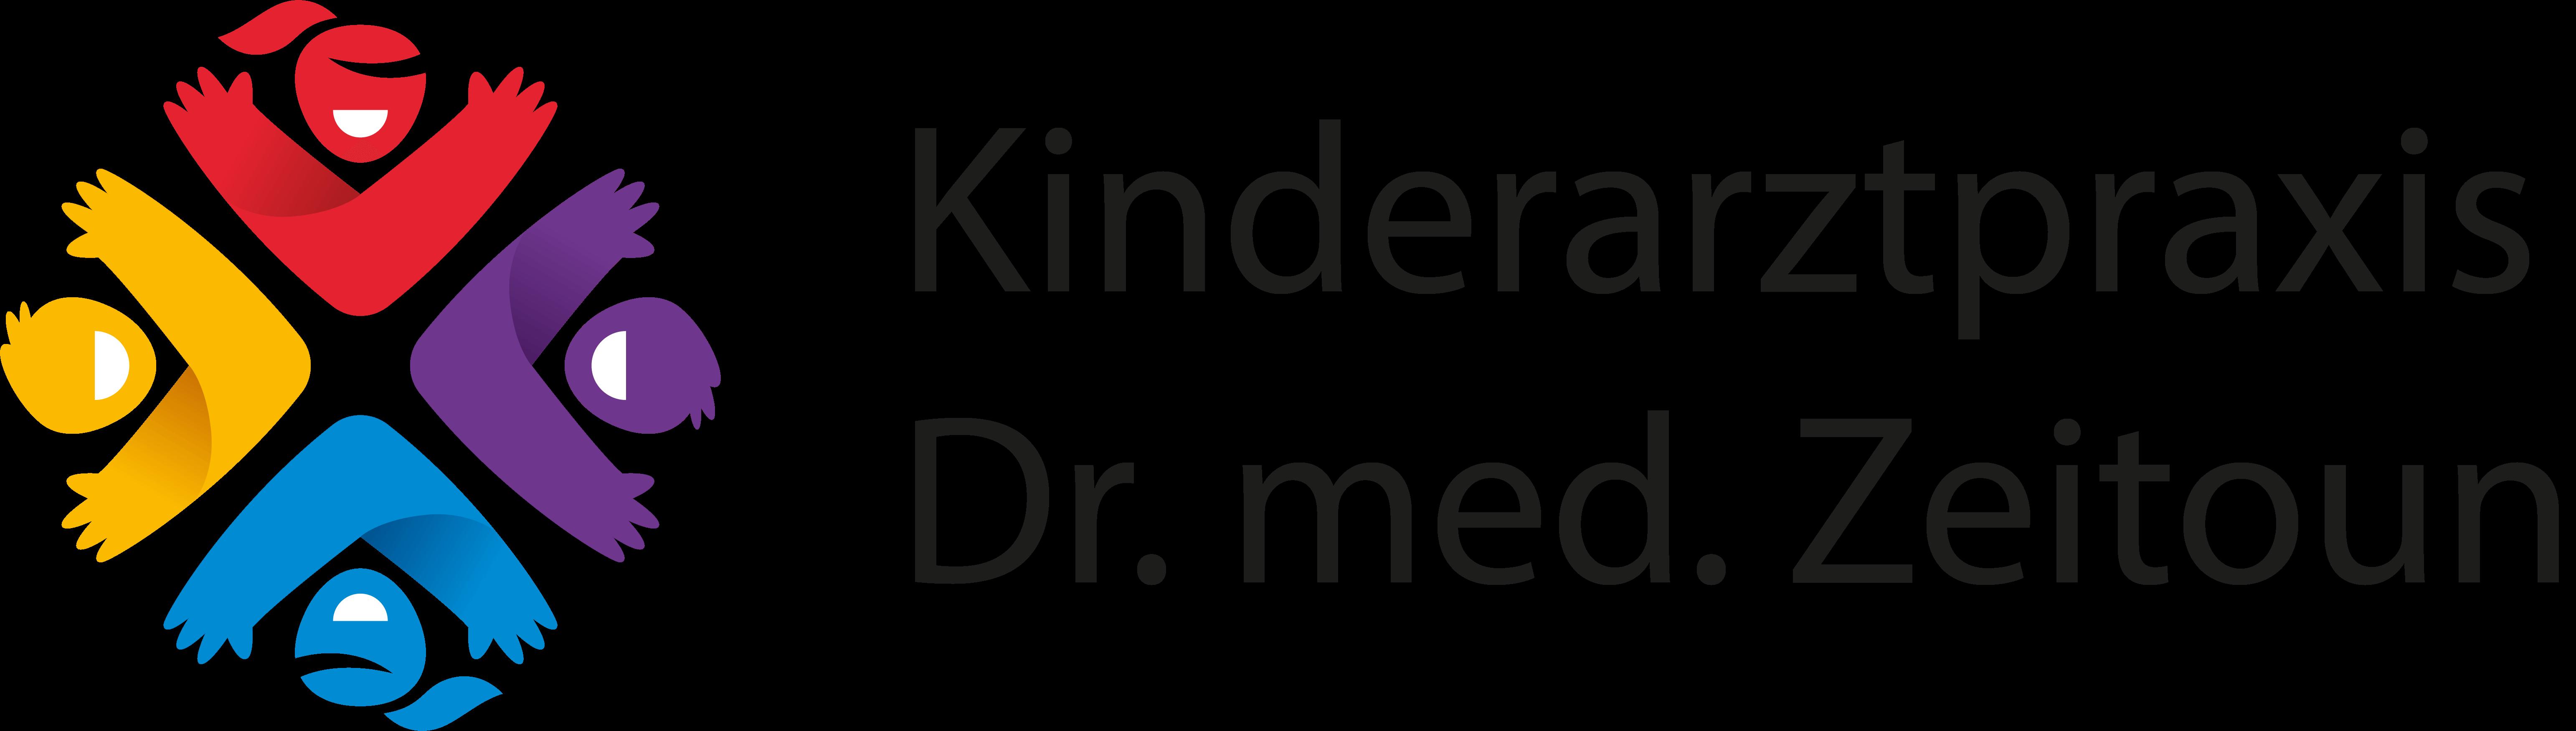 Kinderarztpraxis Dr. med. Zeitoun in Dietikon